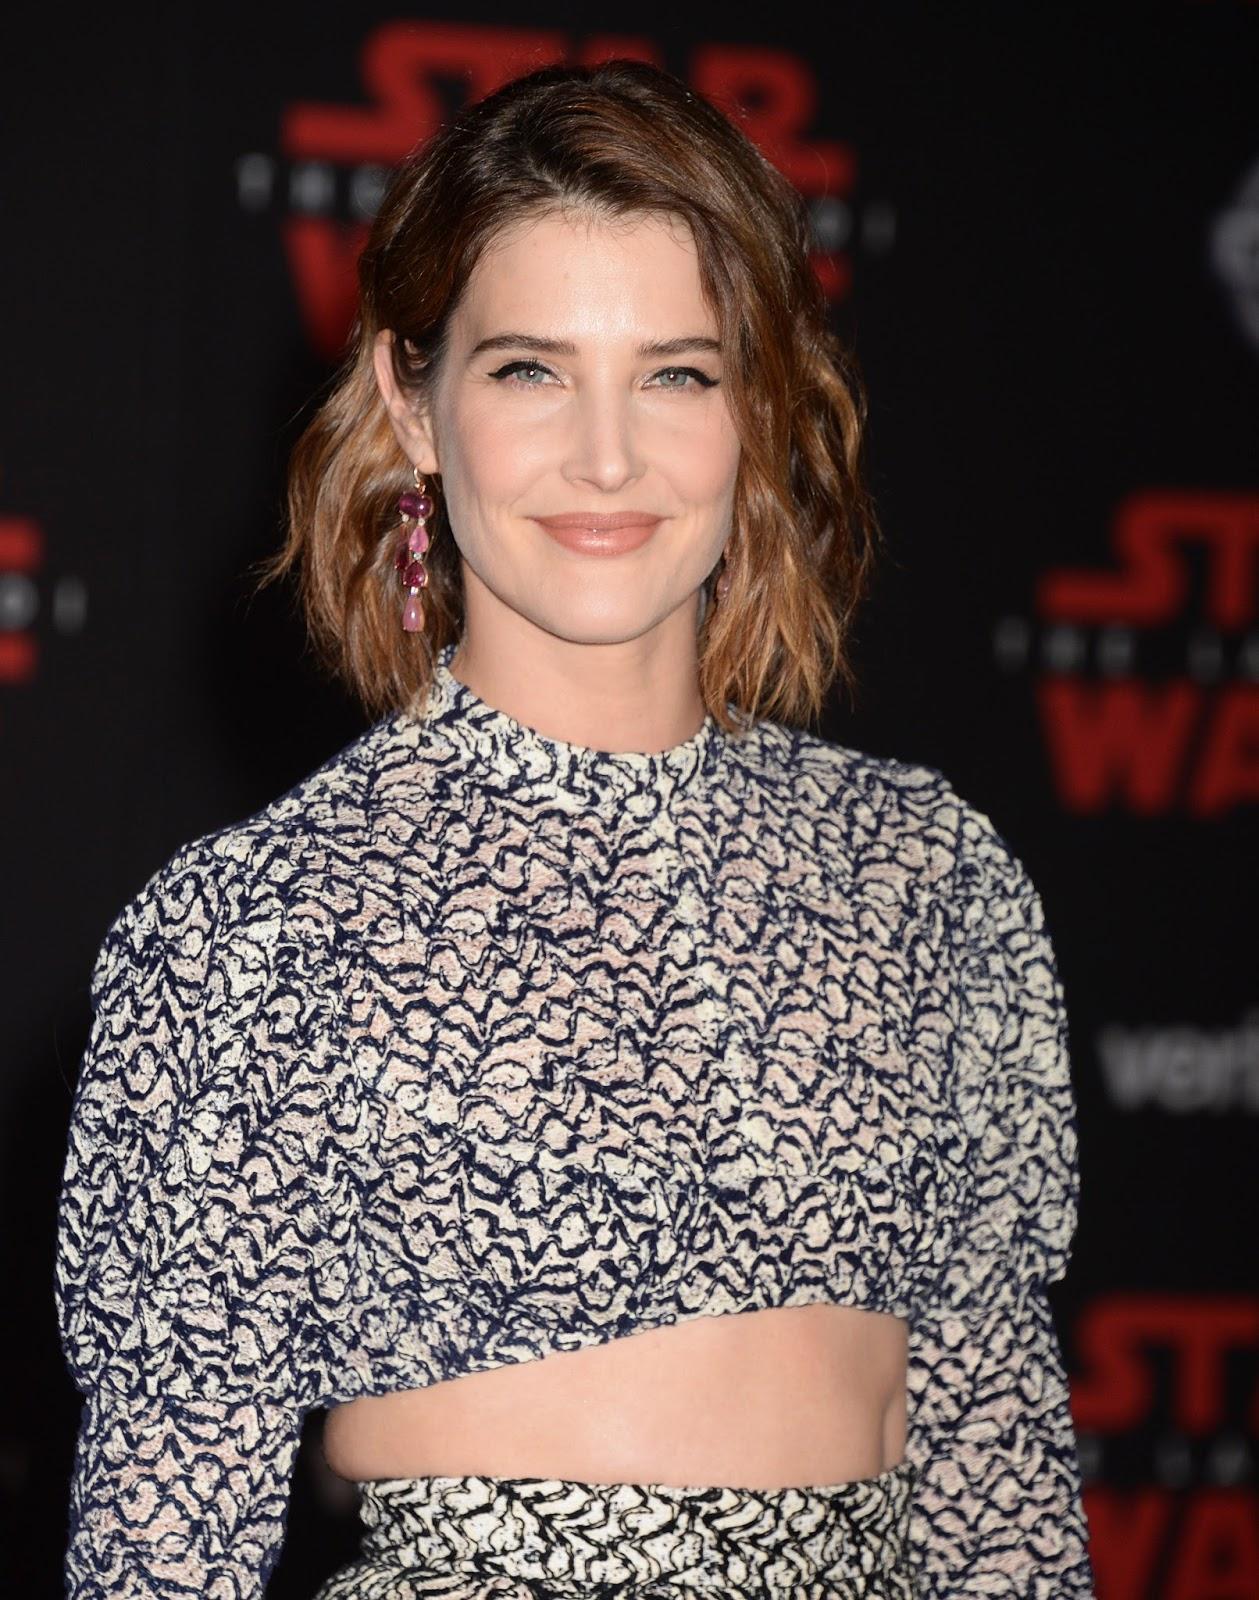 Cobie Smulders Arriving at 'Star Wars The Last Jedi' premiere in Los Angeles